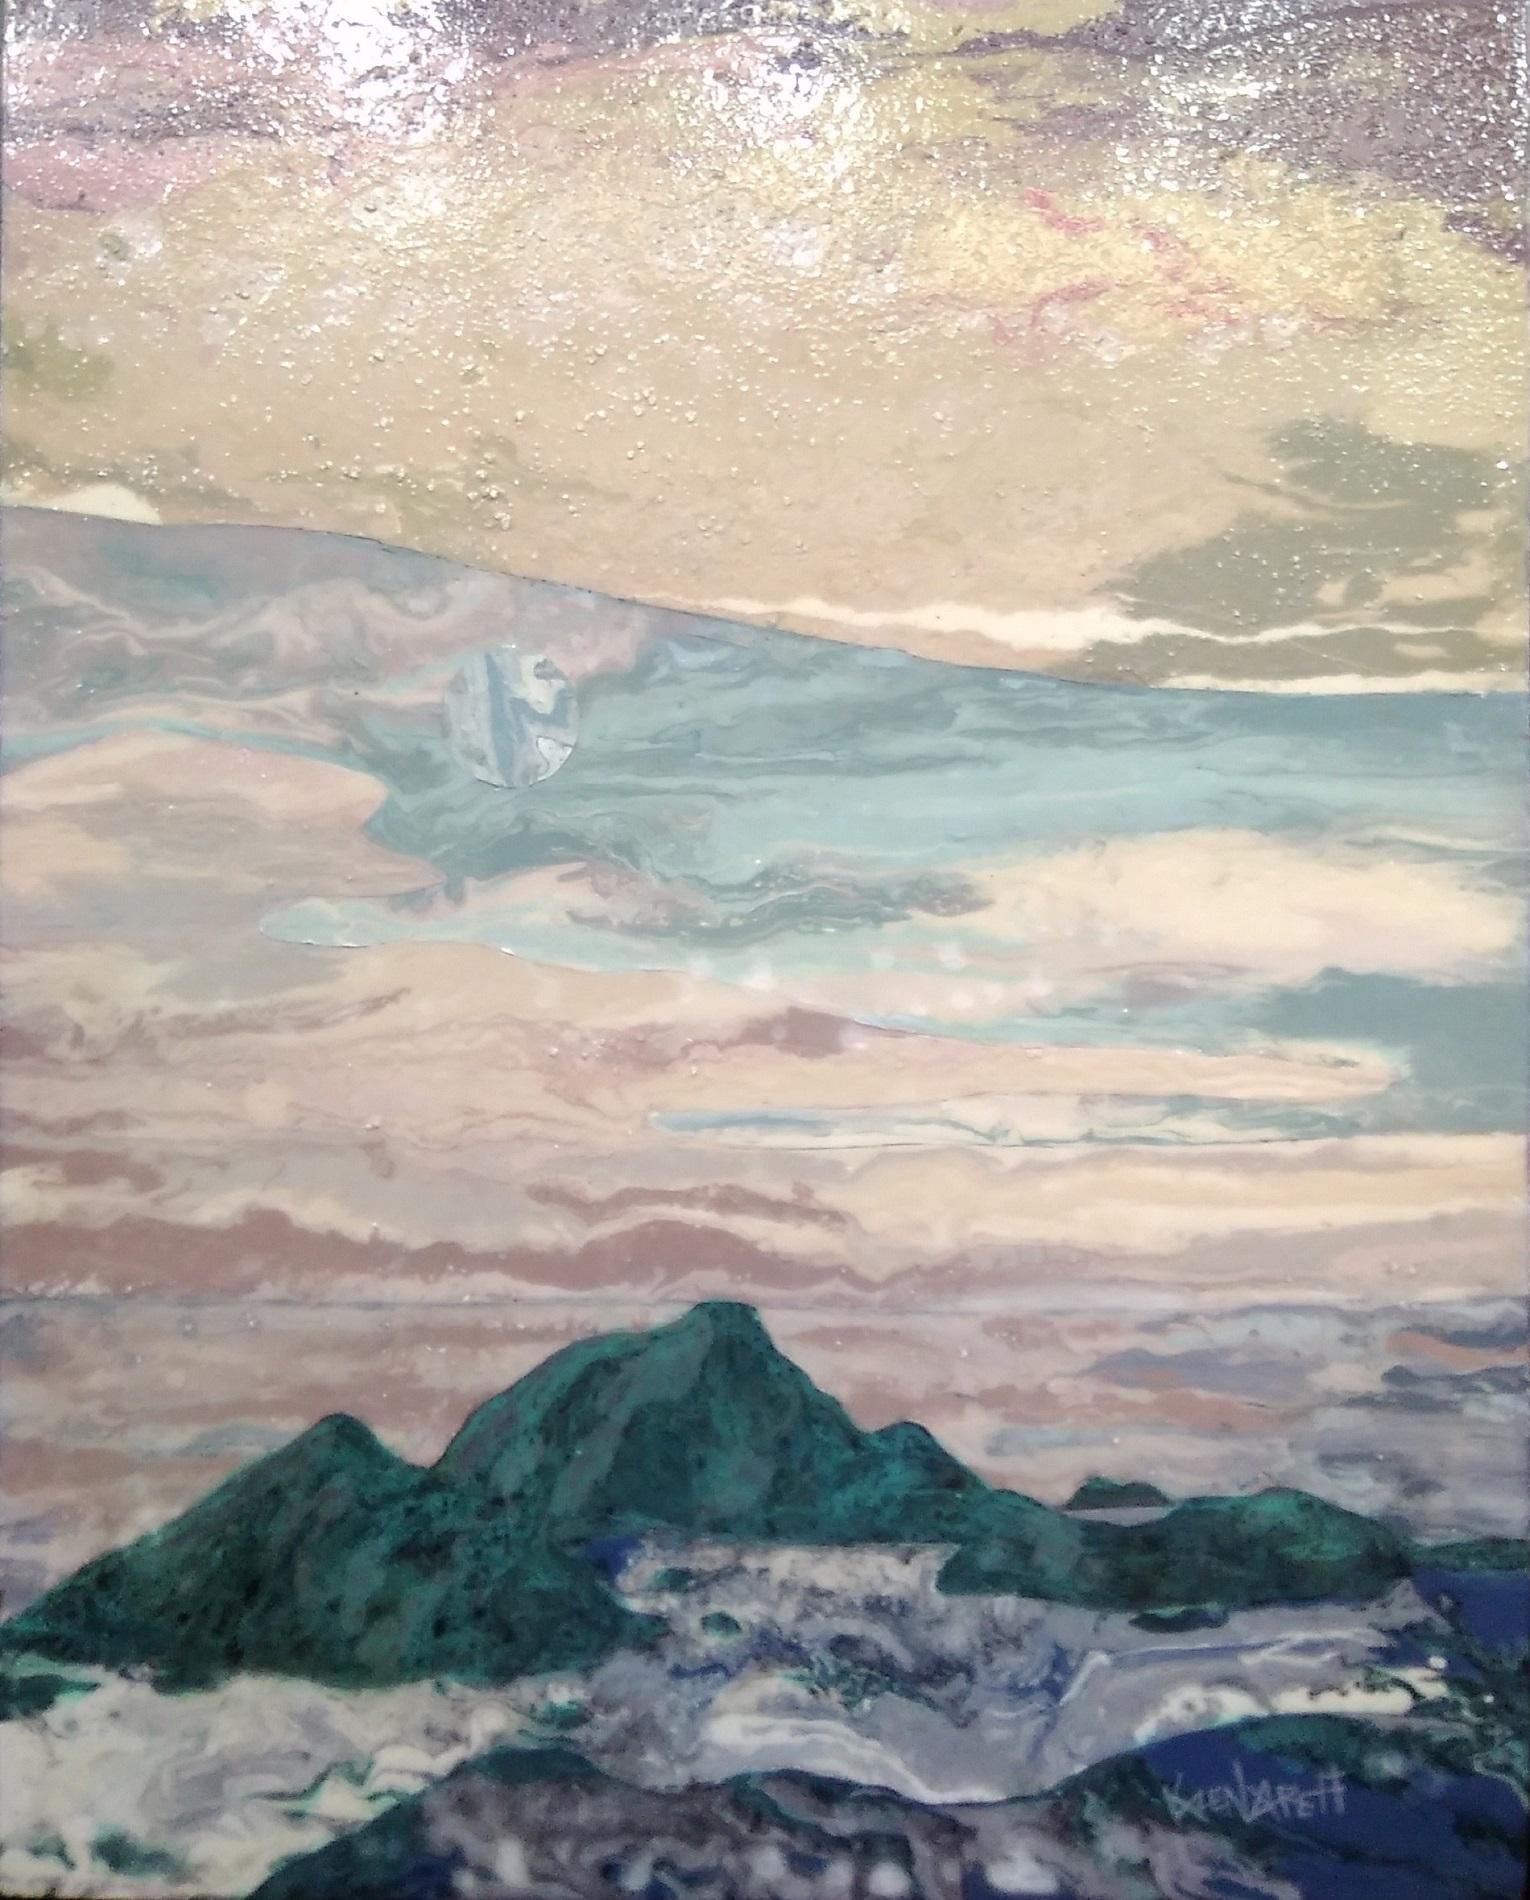 karen_garrett_flat_sculpture_sea_embankment_$1,426